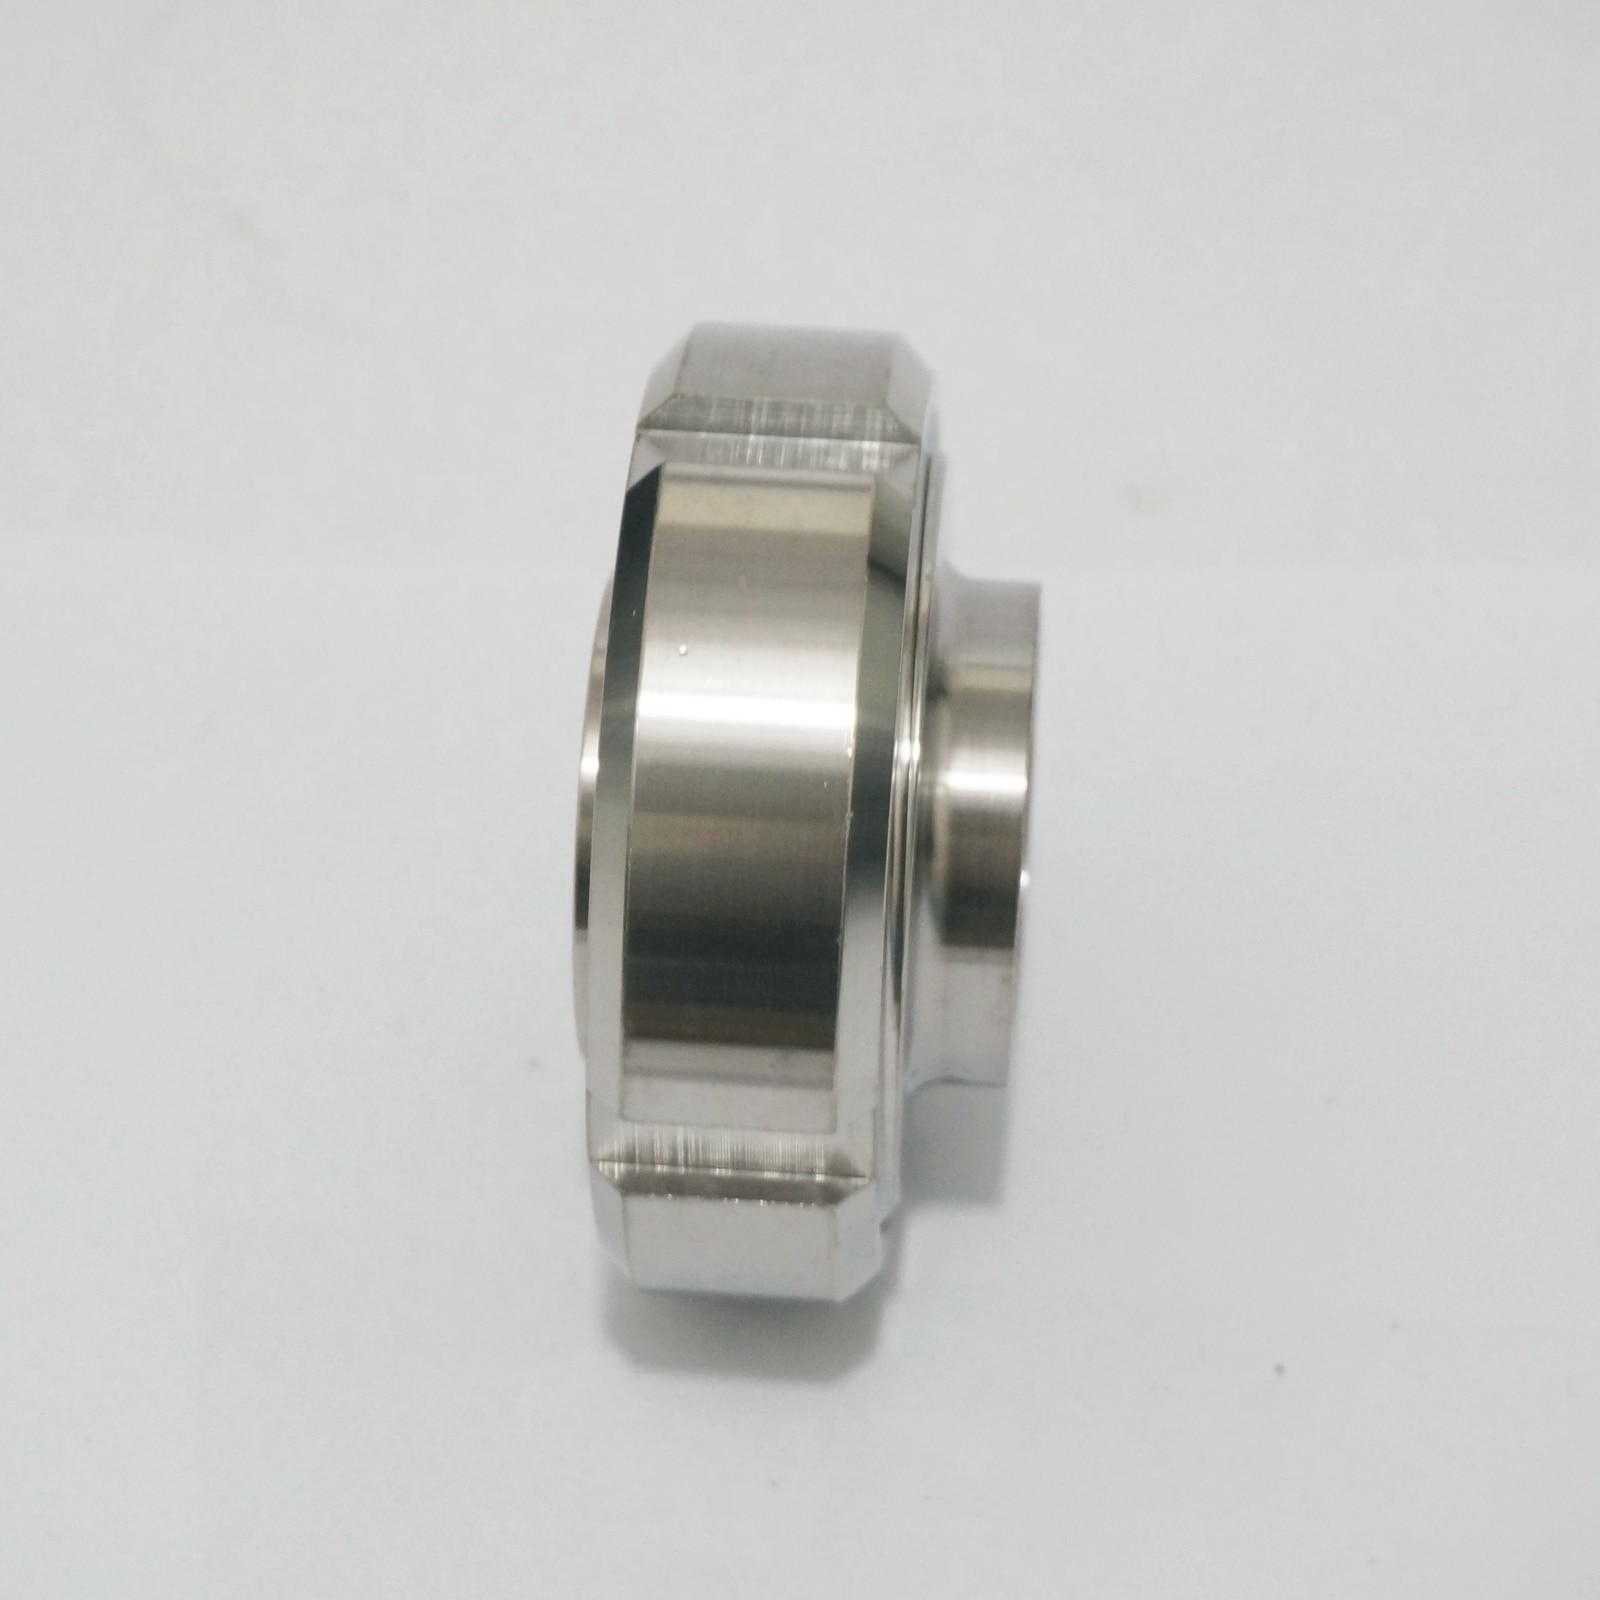 Dn stainless steel sanitary din weld on socket union